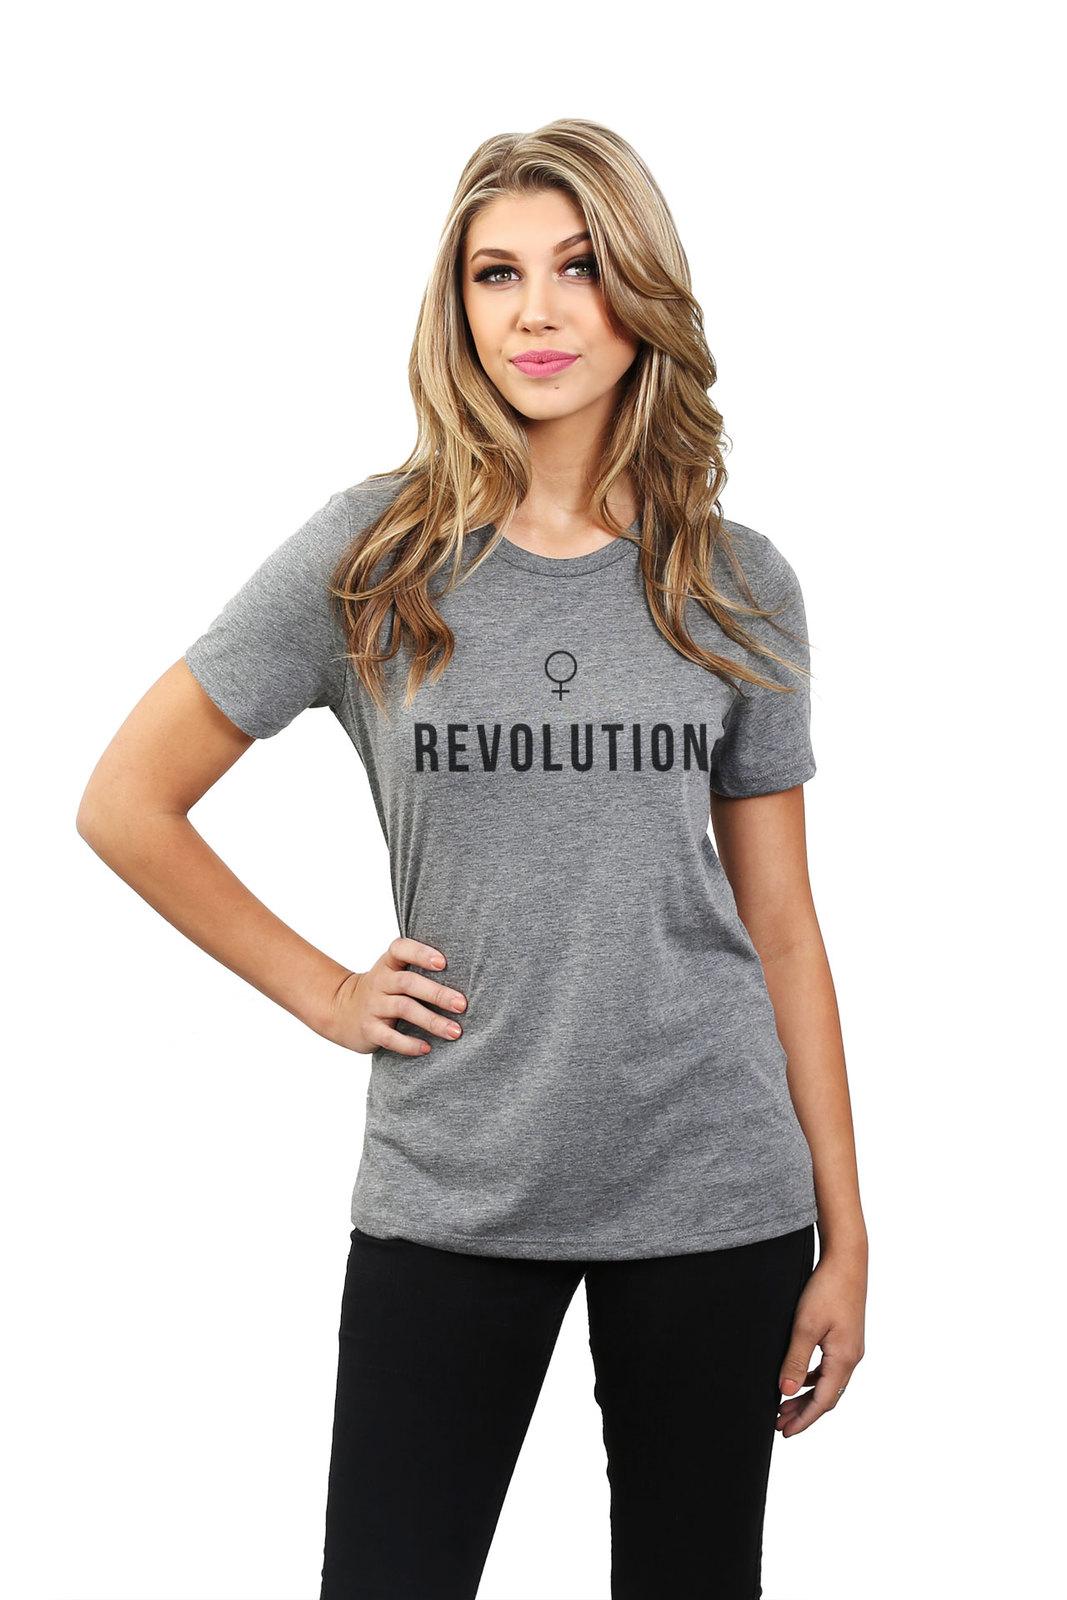 Thread Tank Female Revolution Women's Relaxed T-Shirt Tee Heather Grey